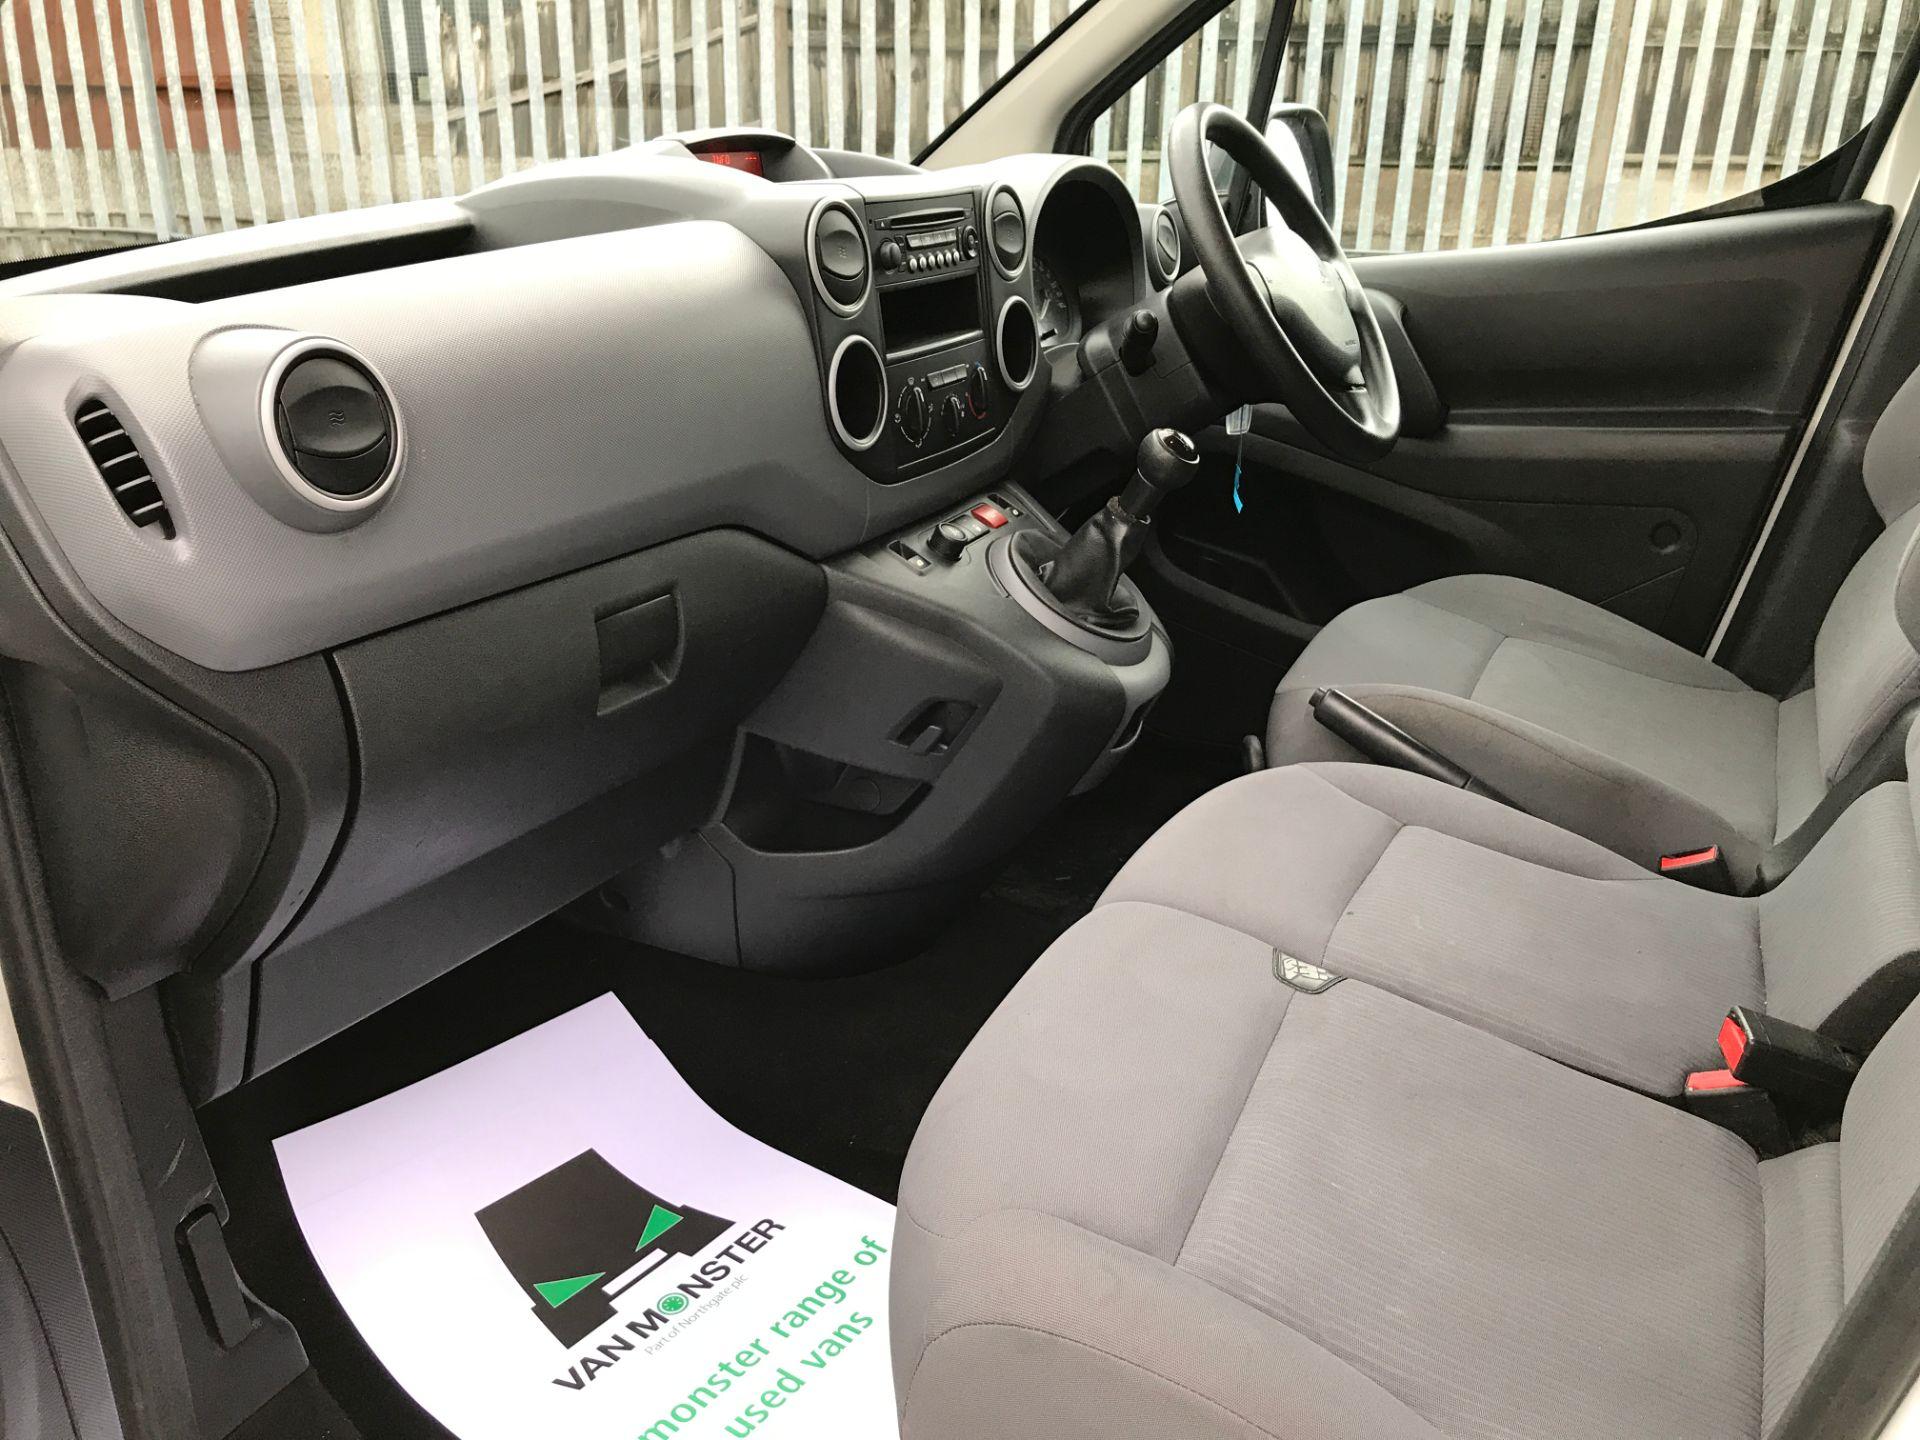 2016 Peugeot Partner L1 850 SE 1.6HDI 92PS  EURO 5 (NU66KWM) Image 12